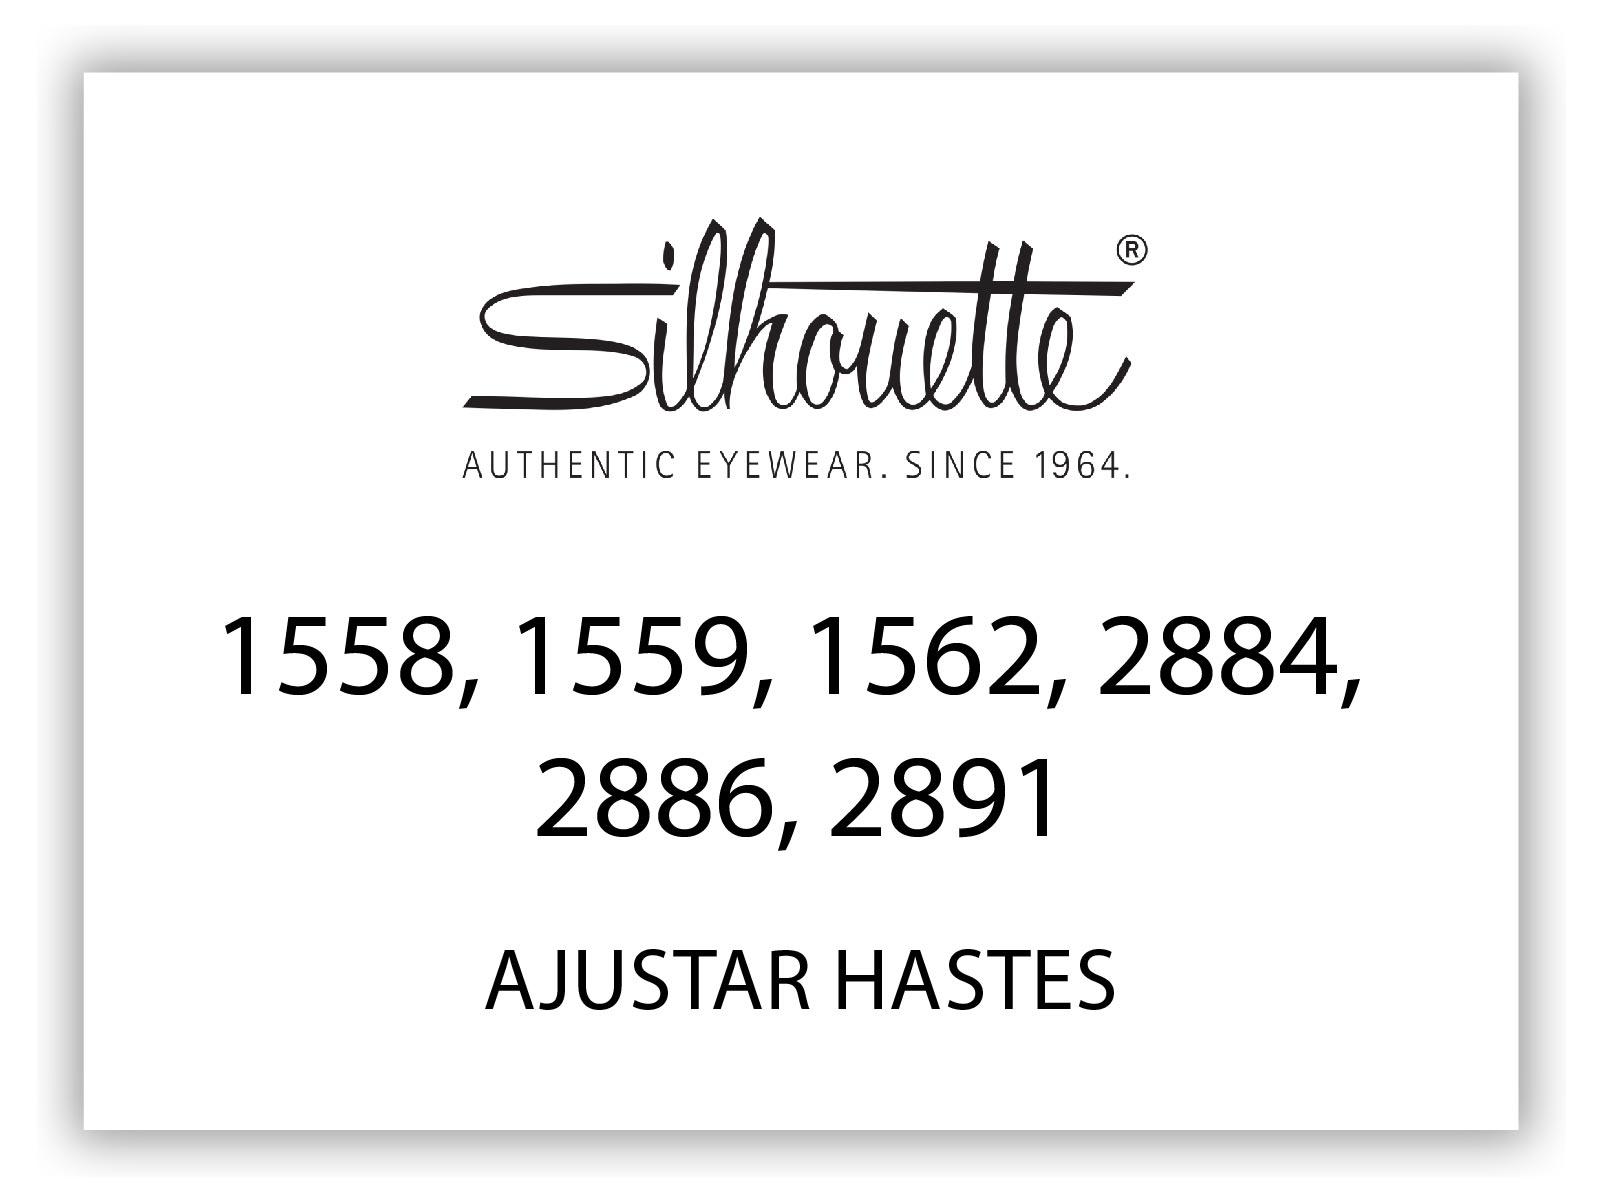 Silhouette_1558-HASTES